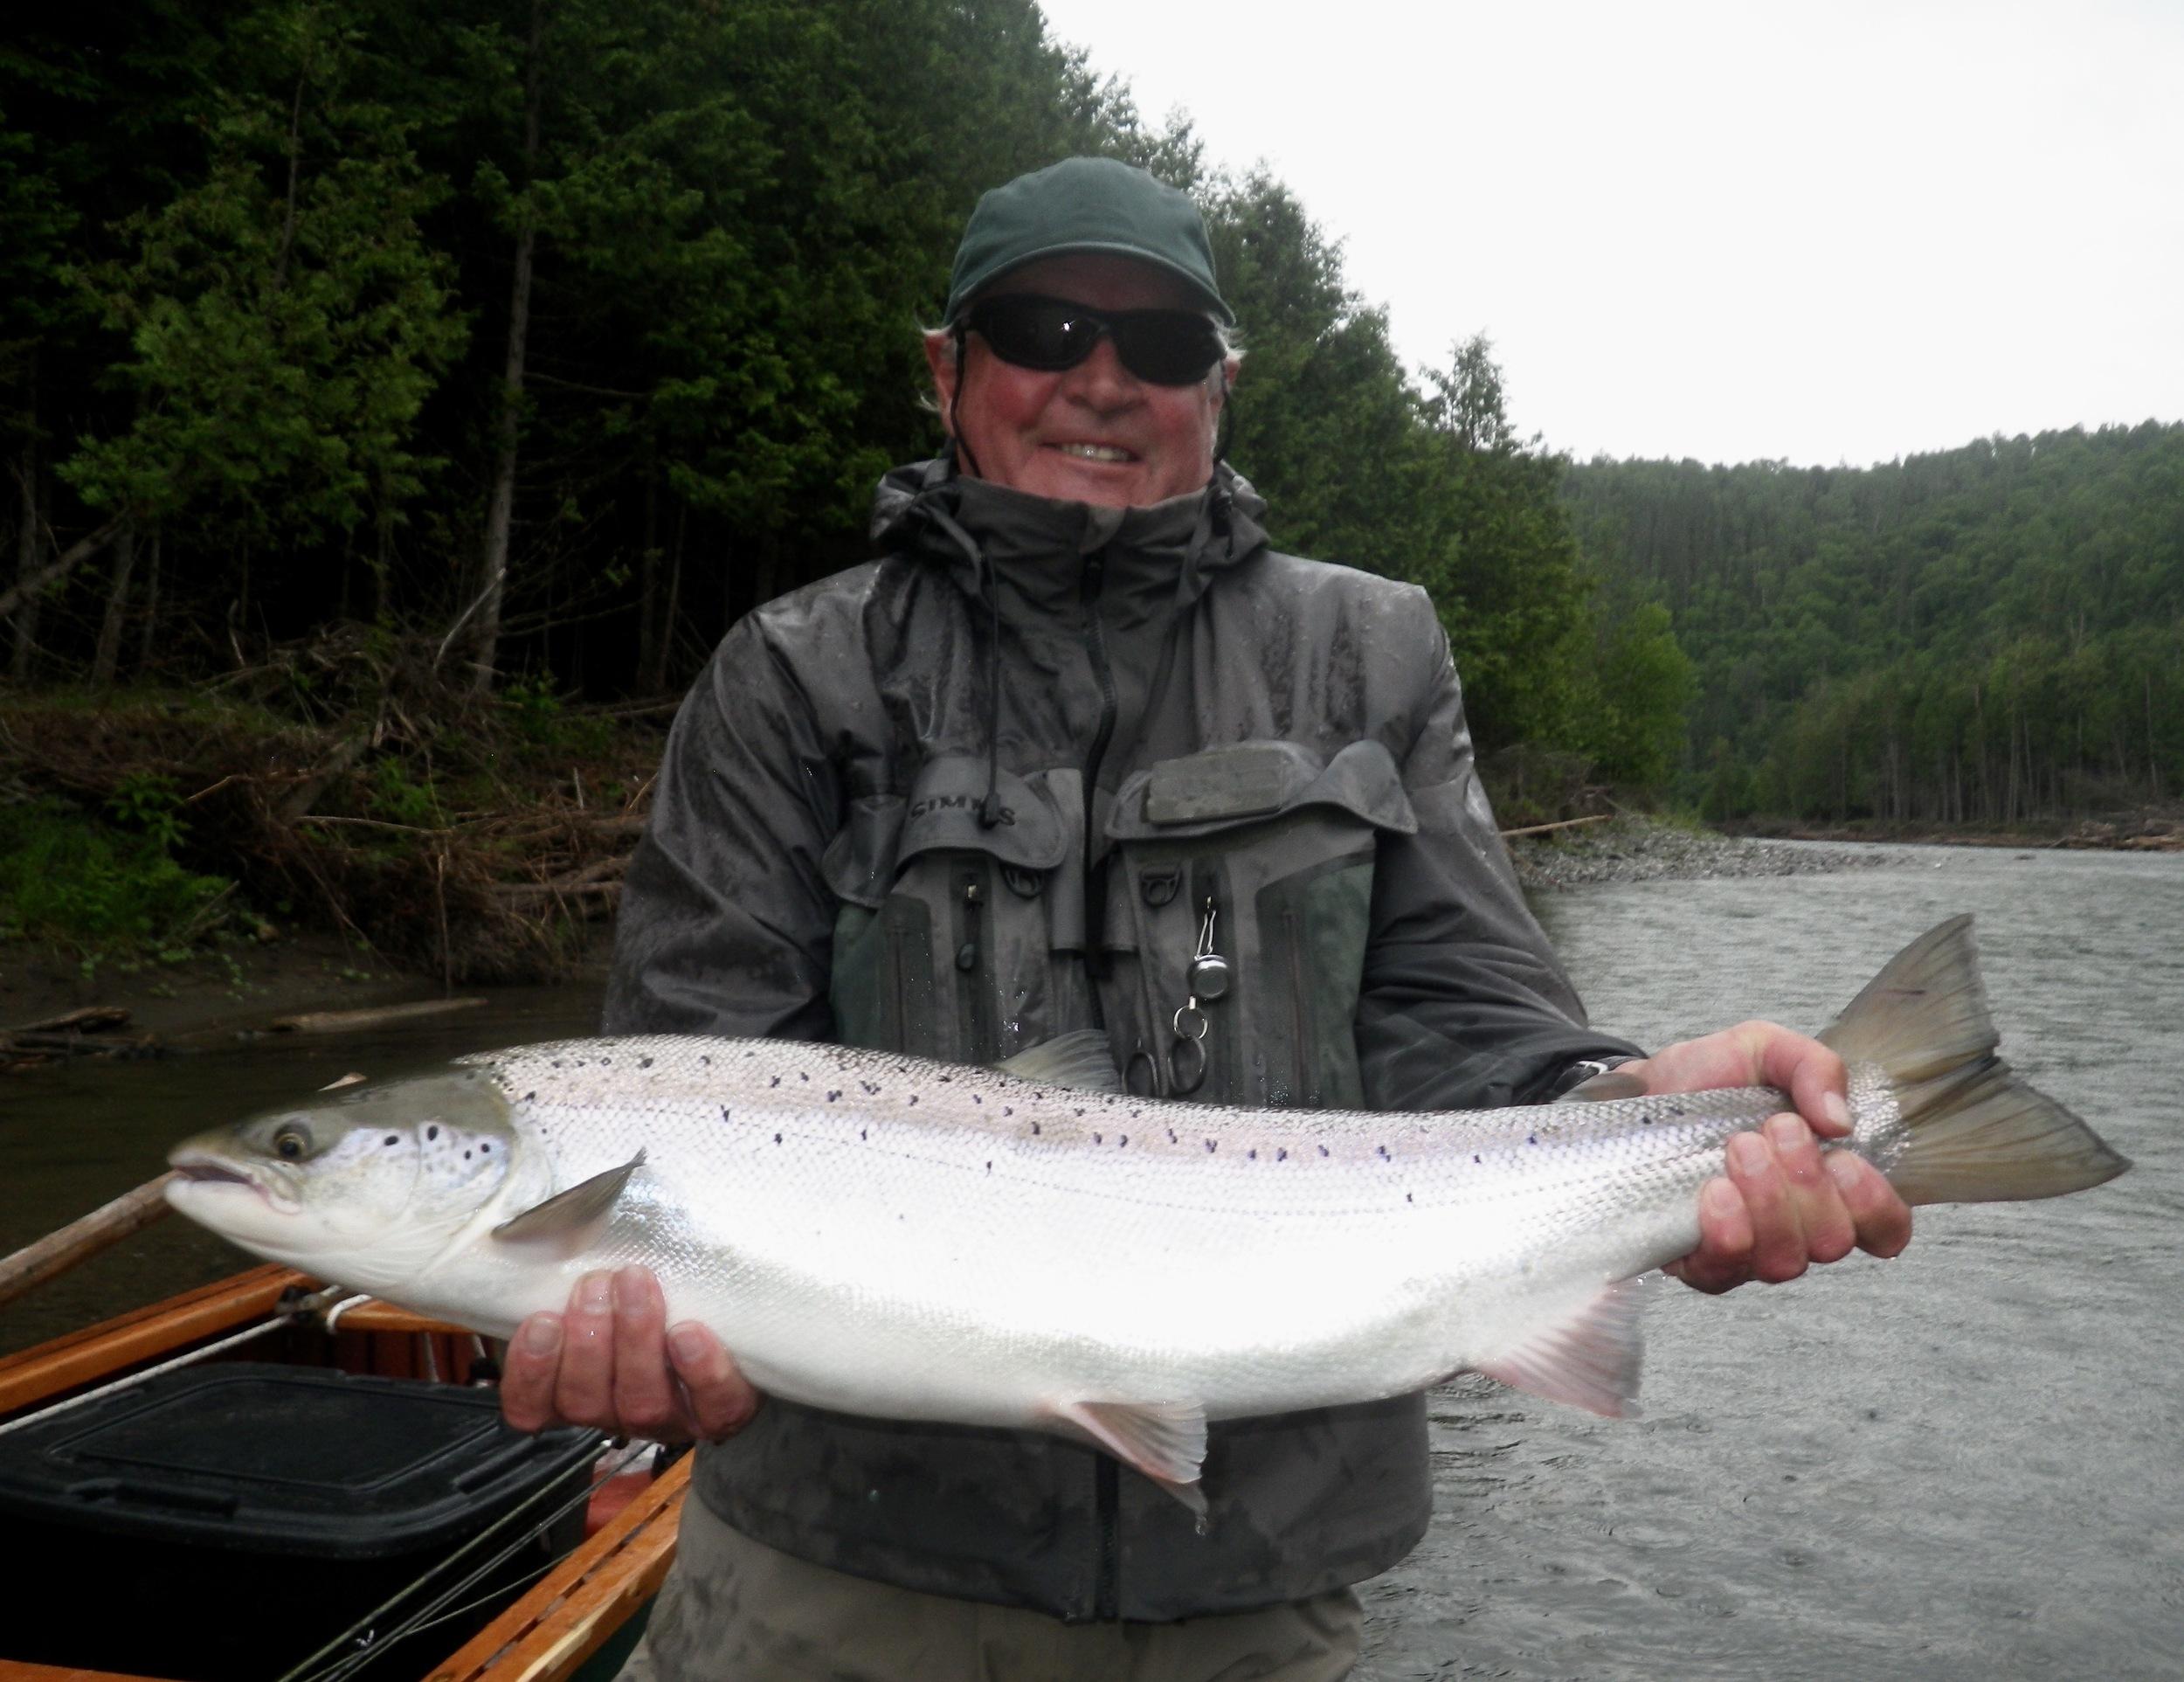 Ian Thorpe with a nice Bonaventure salmon, Congratulations Ian!